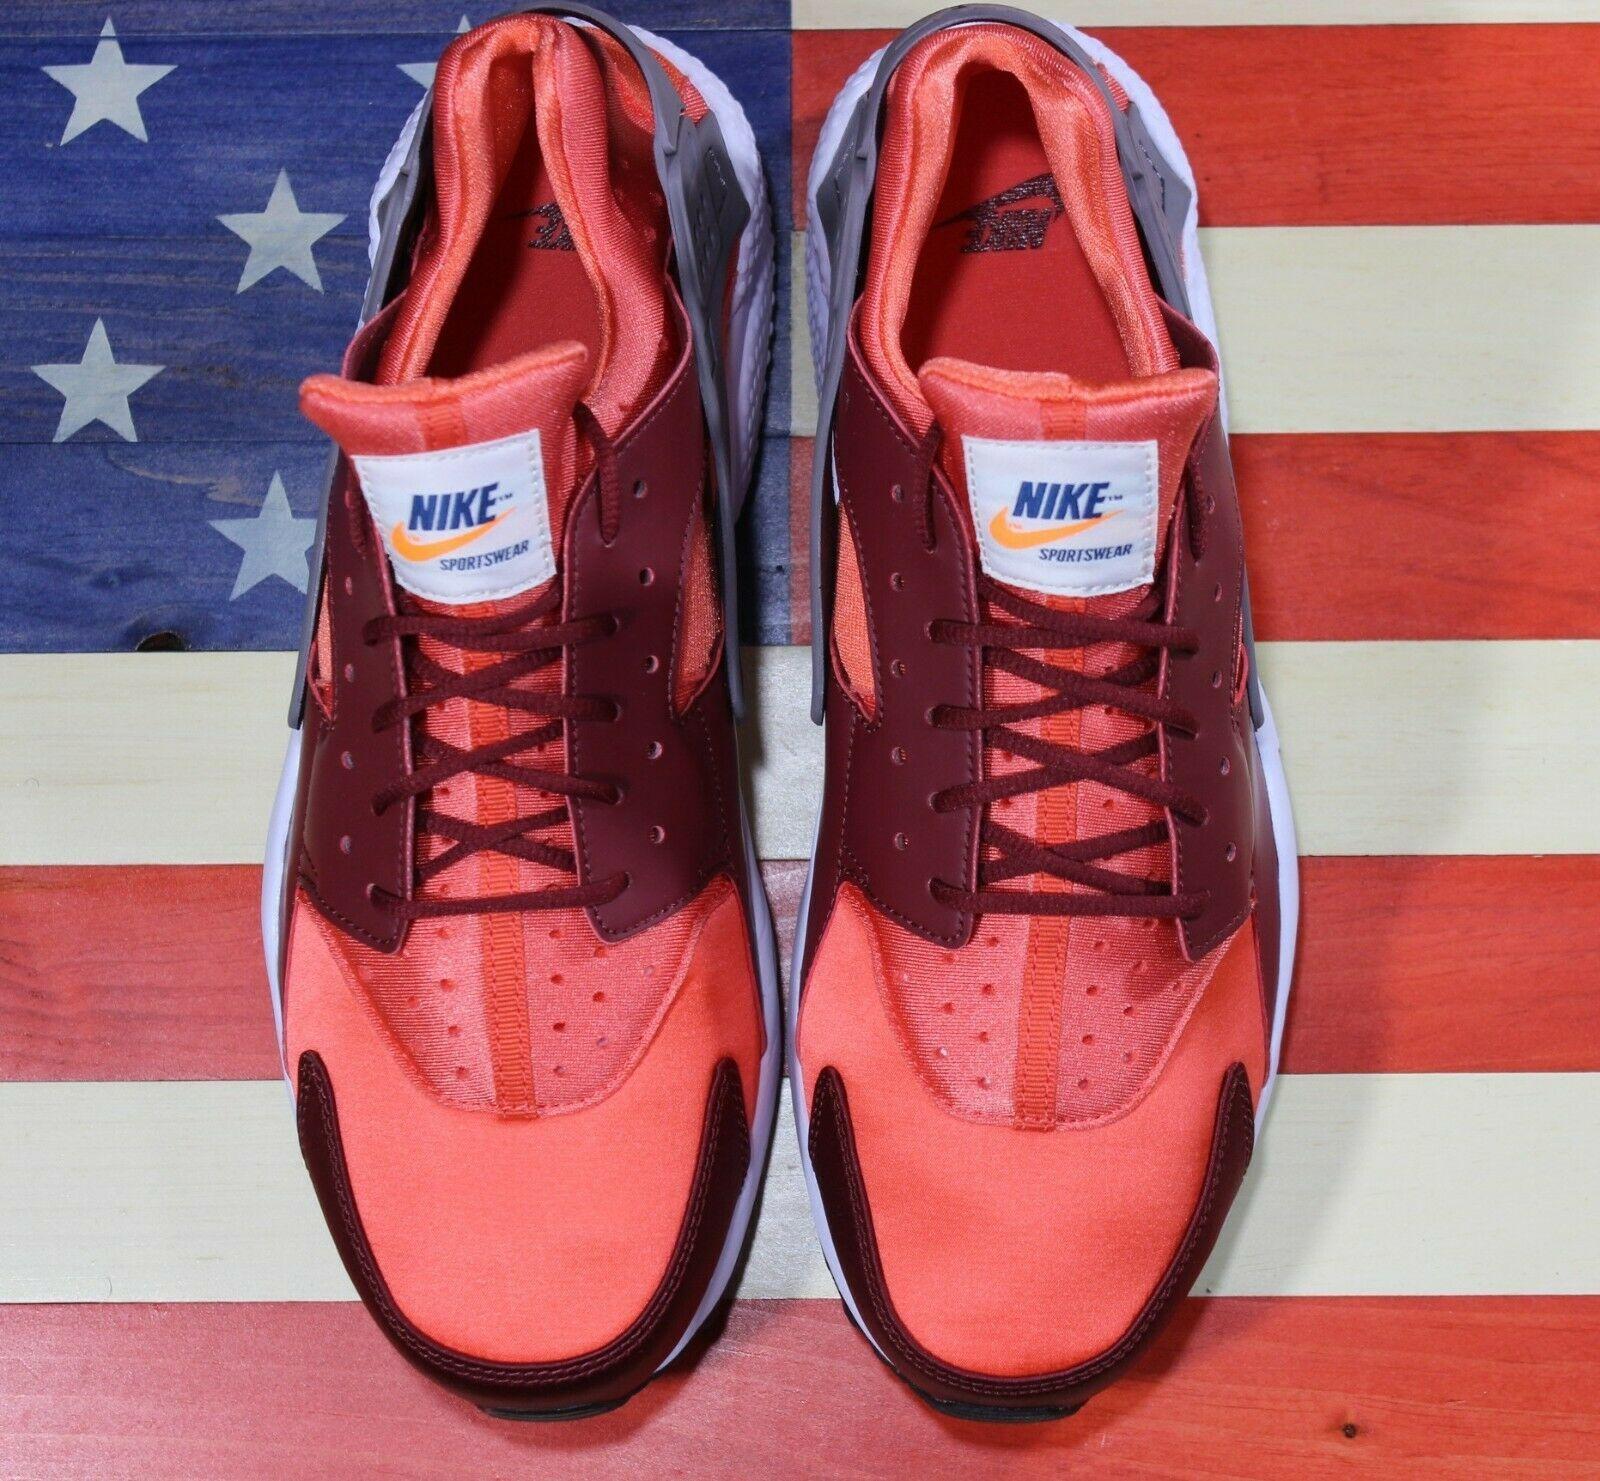 Nike Air Huarache Run Running Shoes Team Red Coral White [318429-054] Men's 11.5 image 11